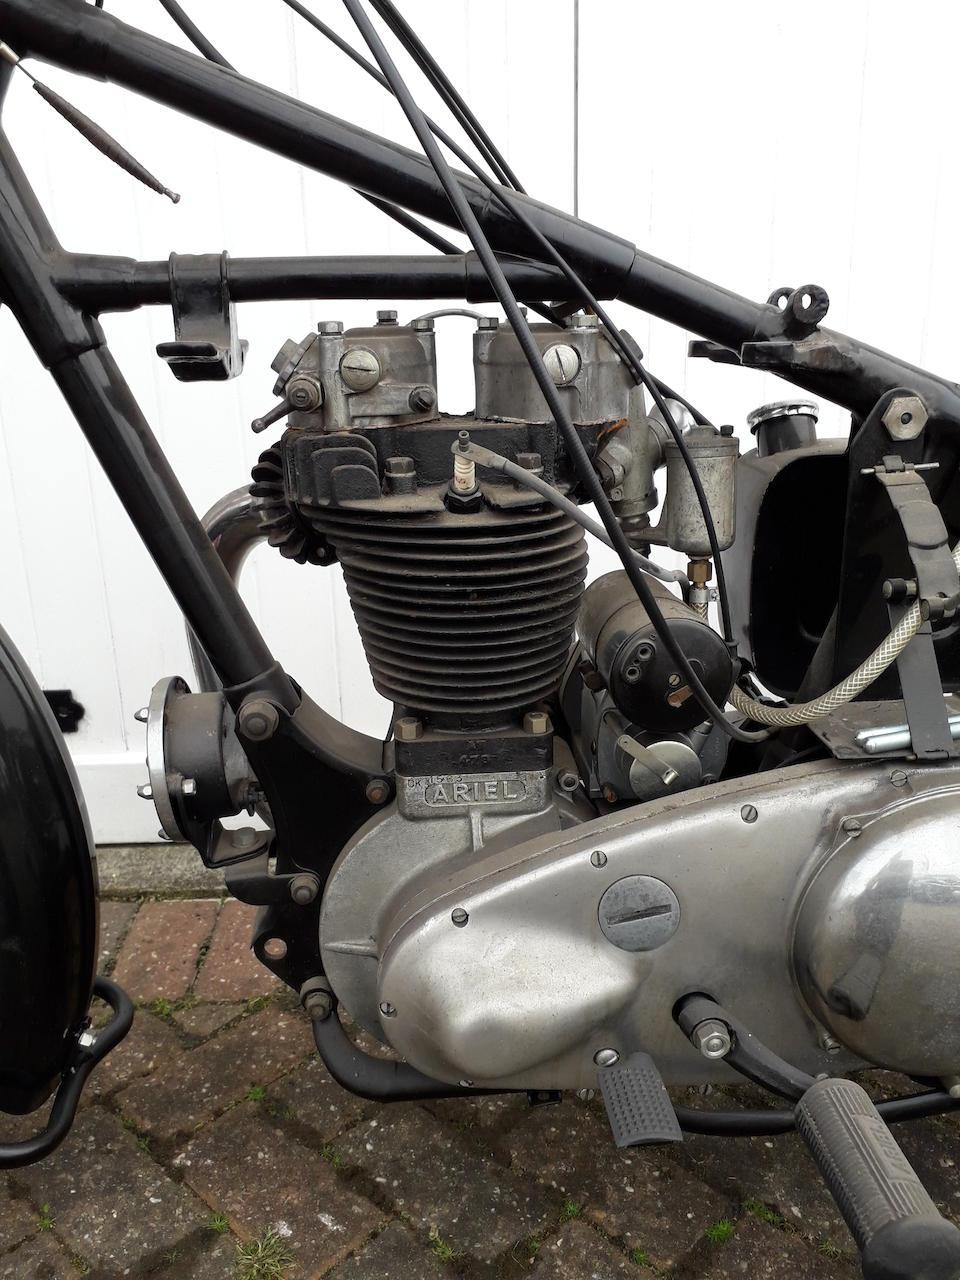 1946 Ariel 499cc VH2 Red Hunter Project Frame no. BP2441 Engine no. CK1563